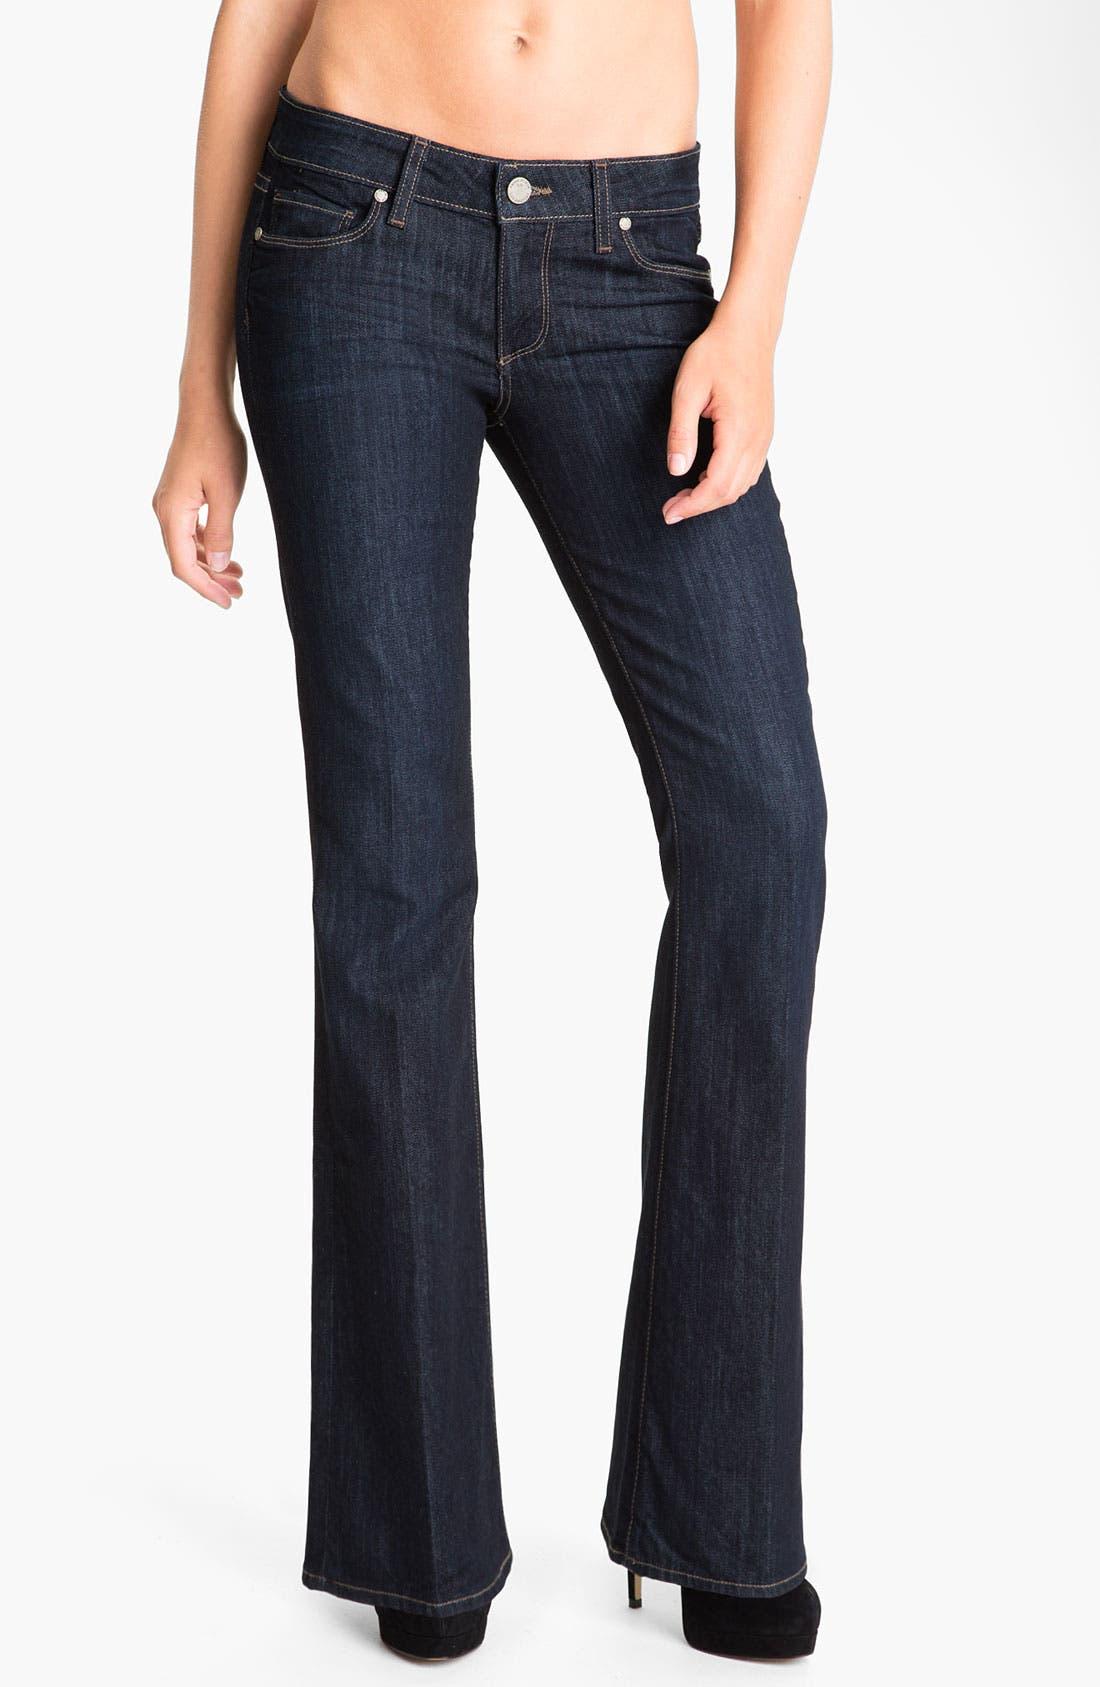 Main Image - Paige Denim 'Skyline' Bootcut Jeans (Dream) (Petite)